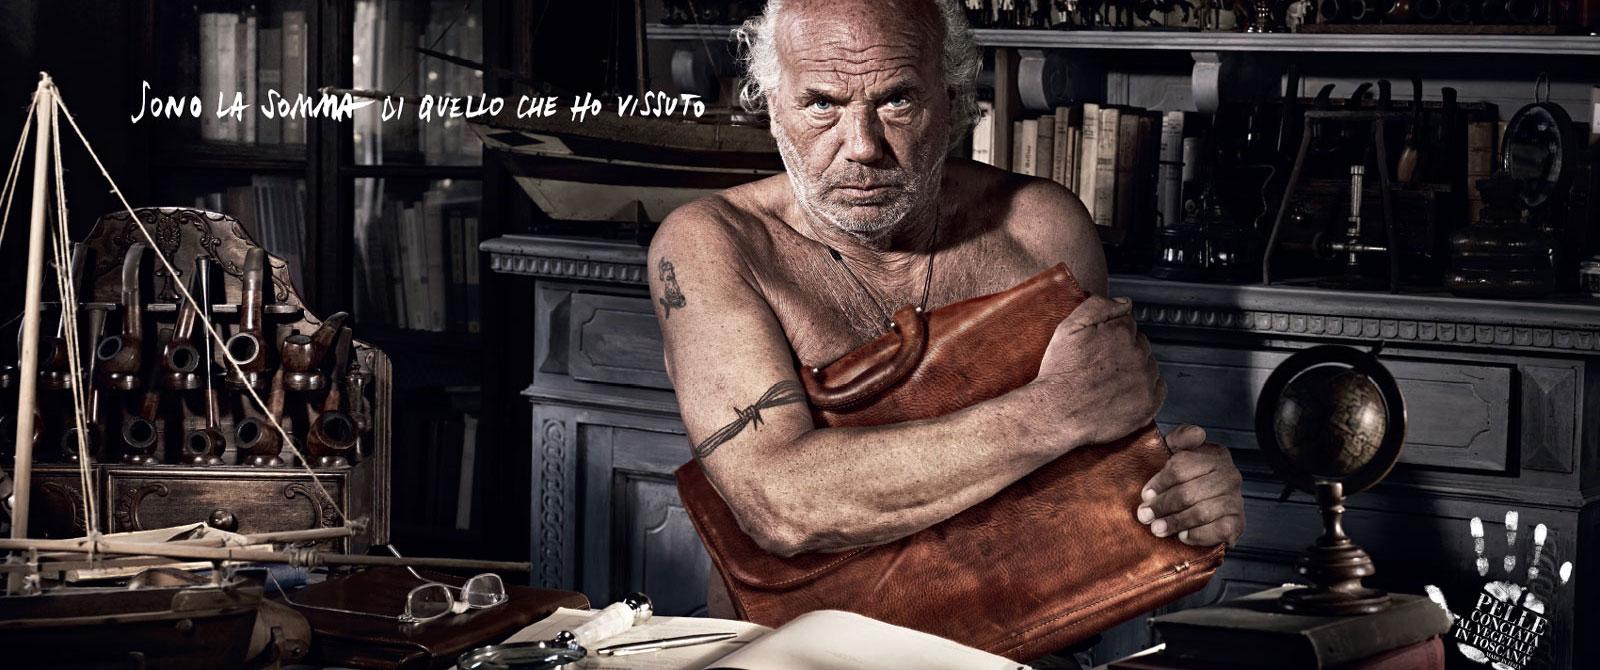 Verapelle - Campagna pubblicitaria 2014